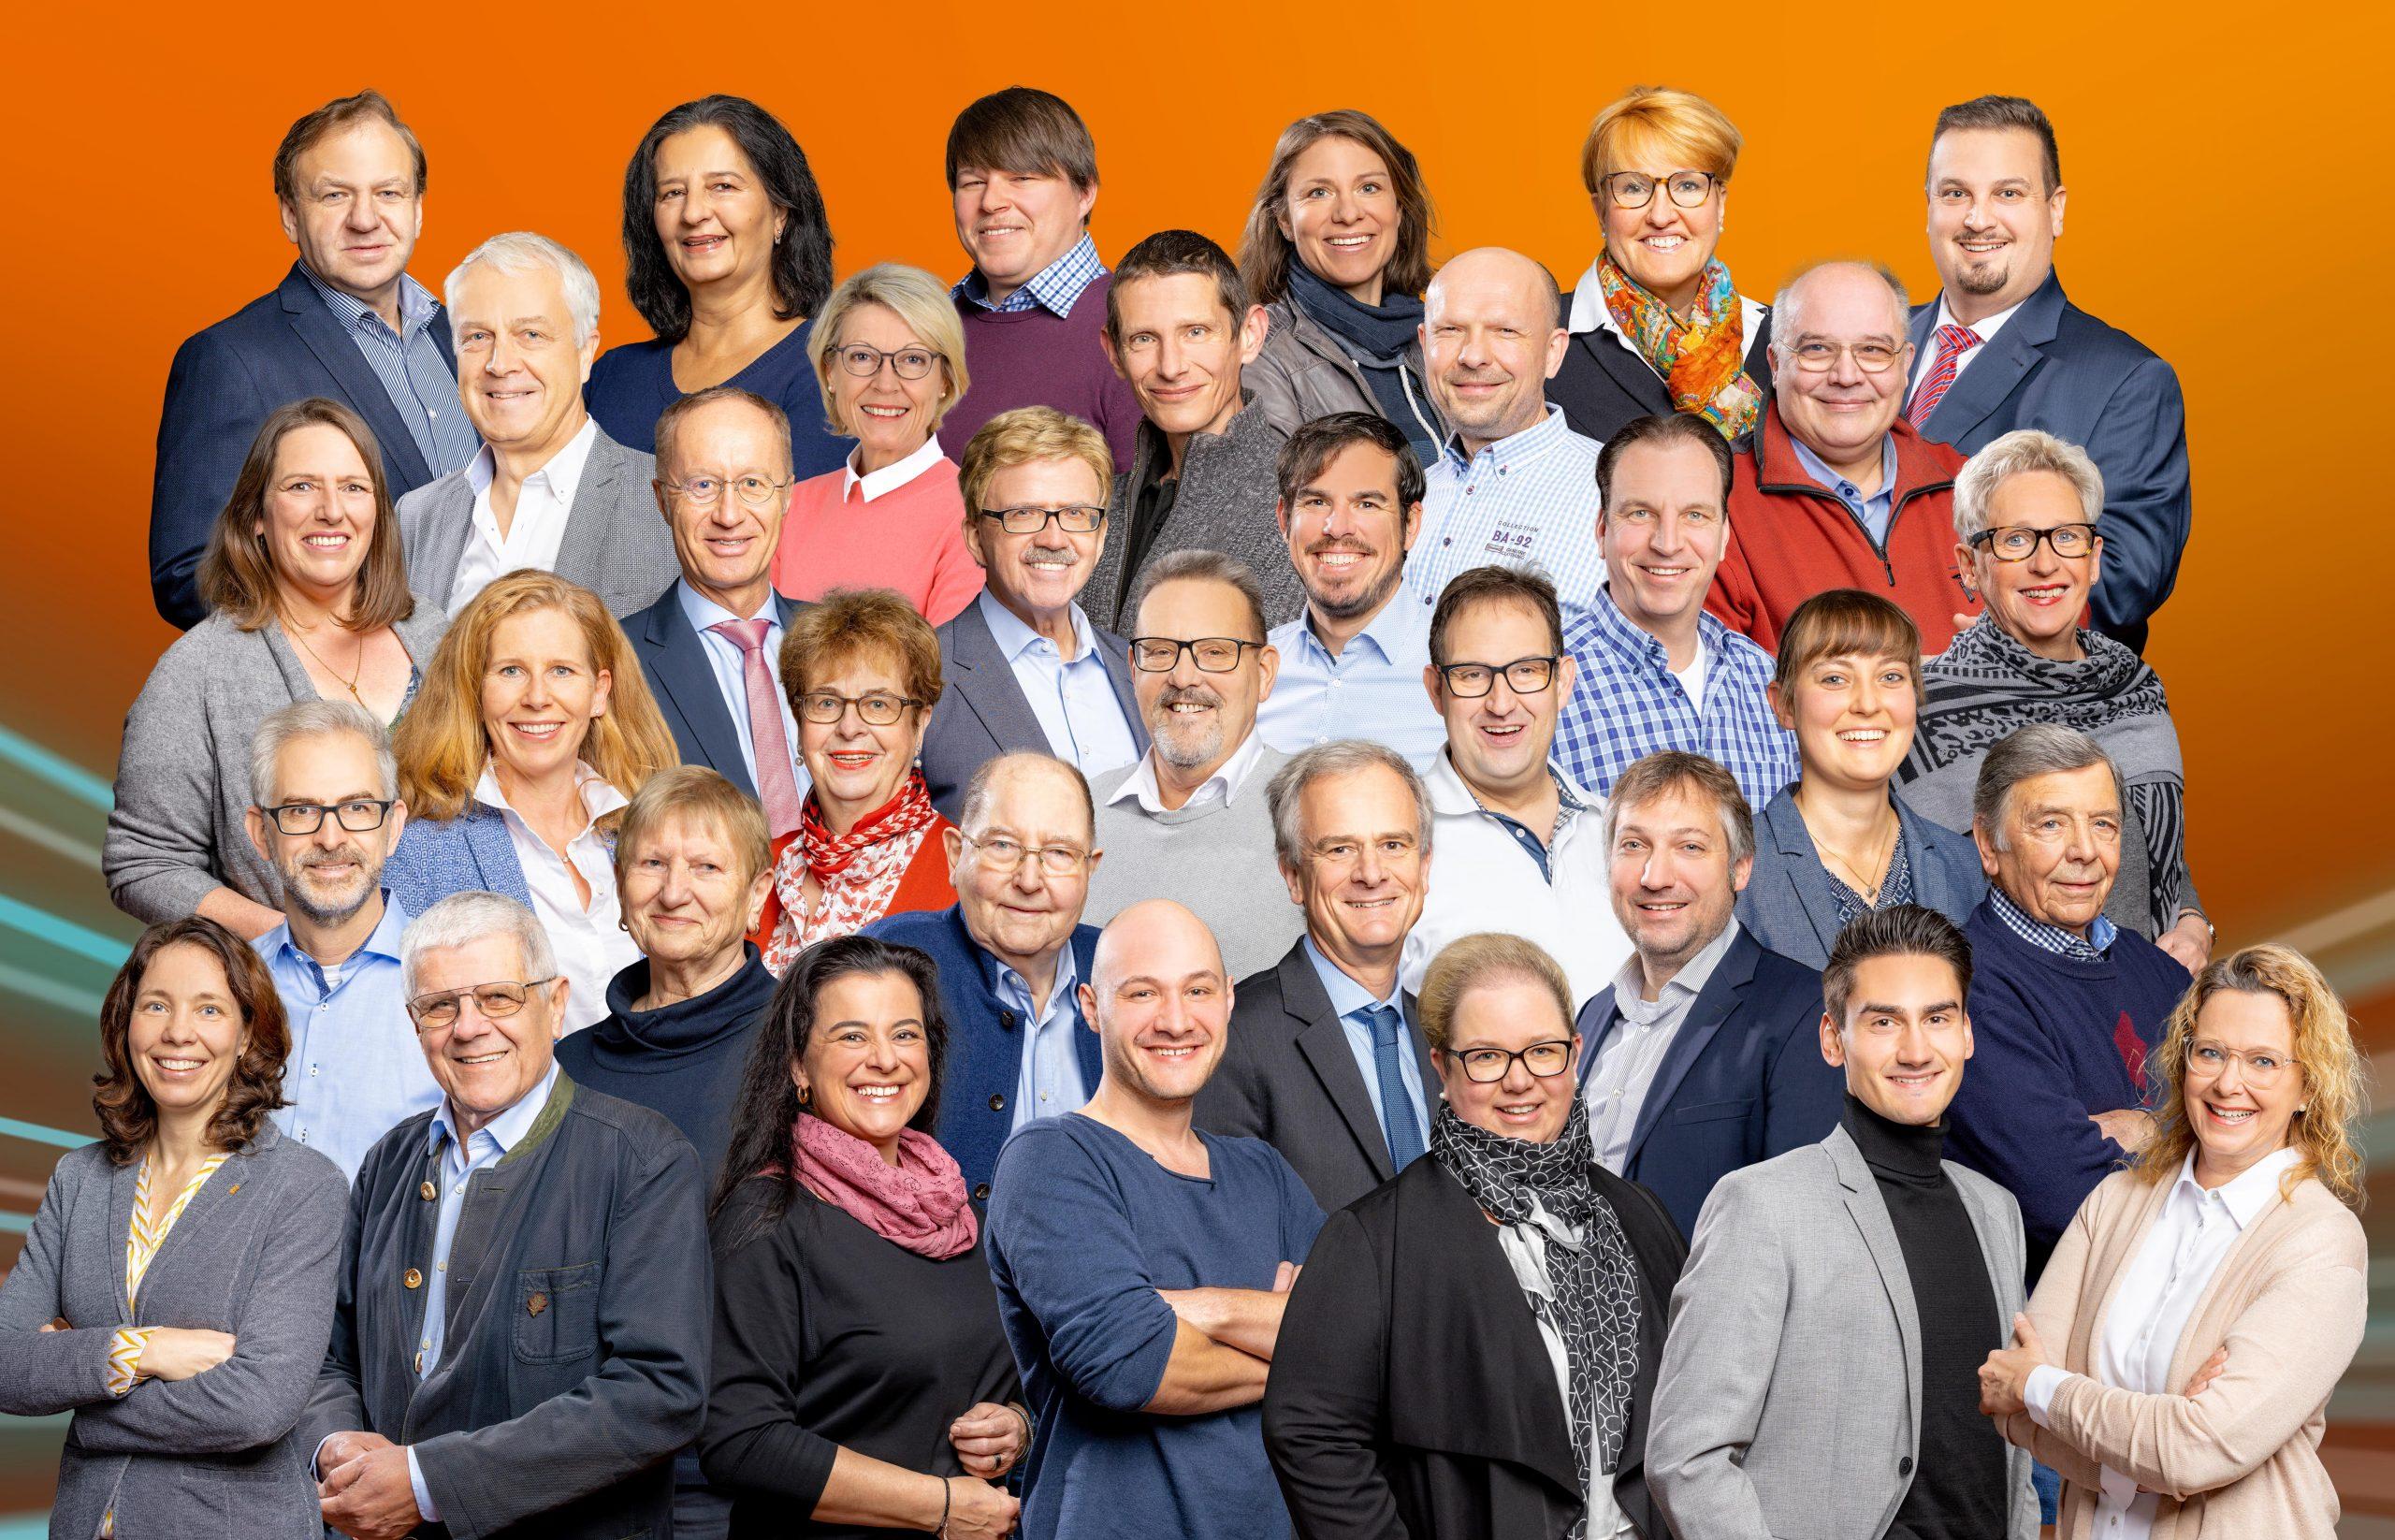 Gruppenbild unserer Kandidaten